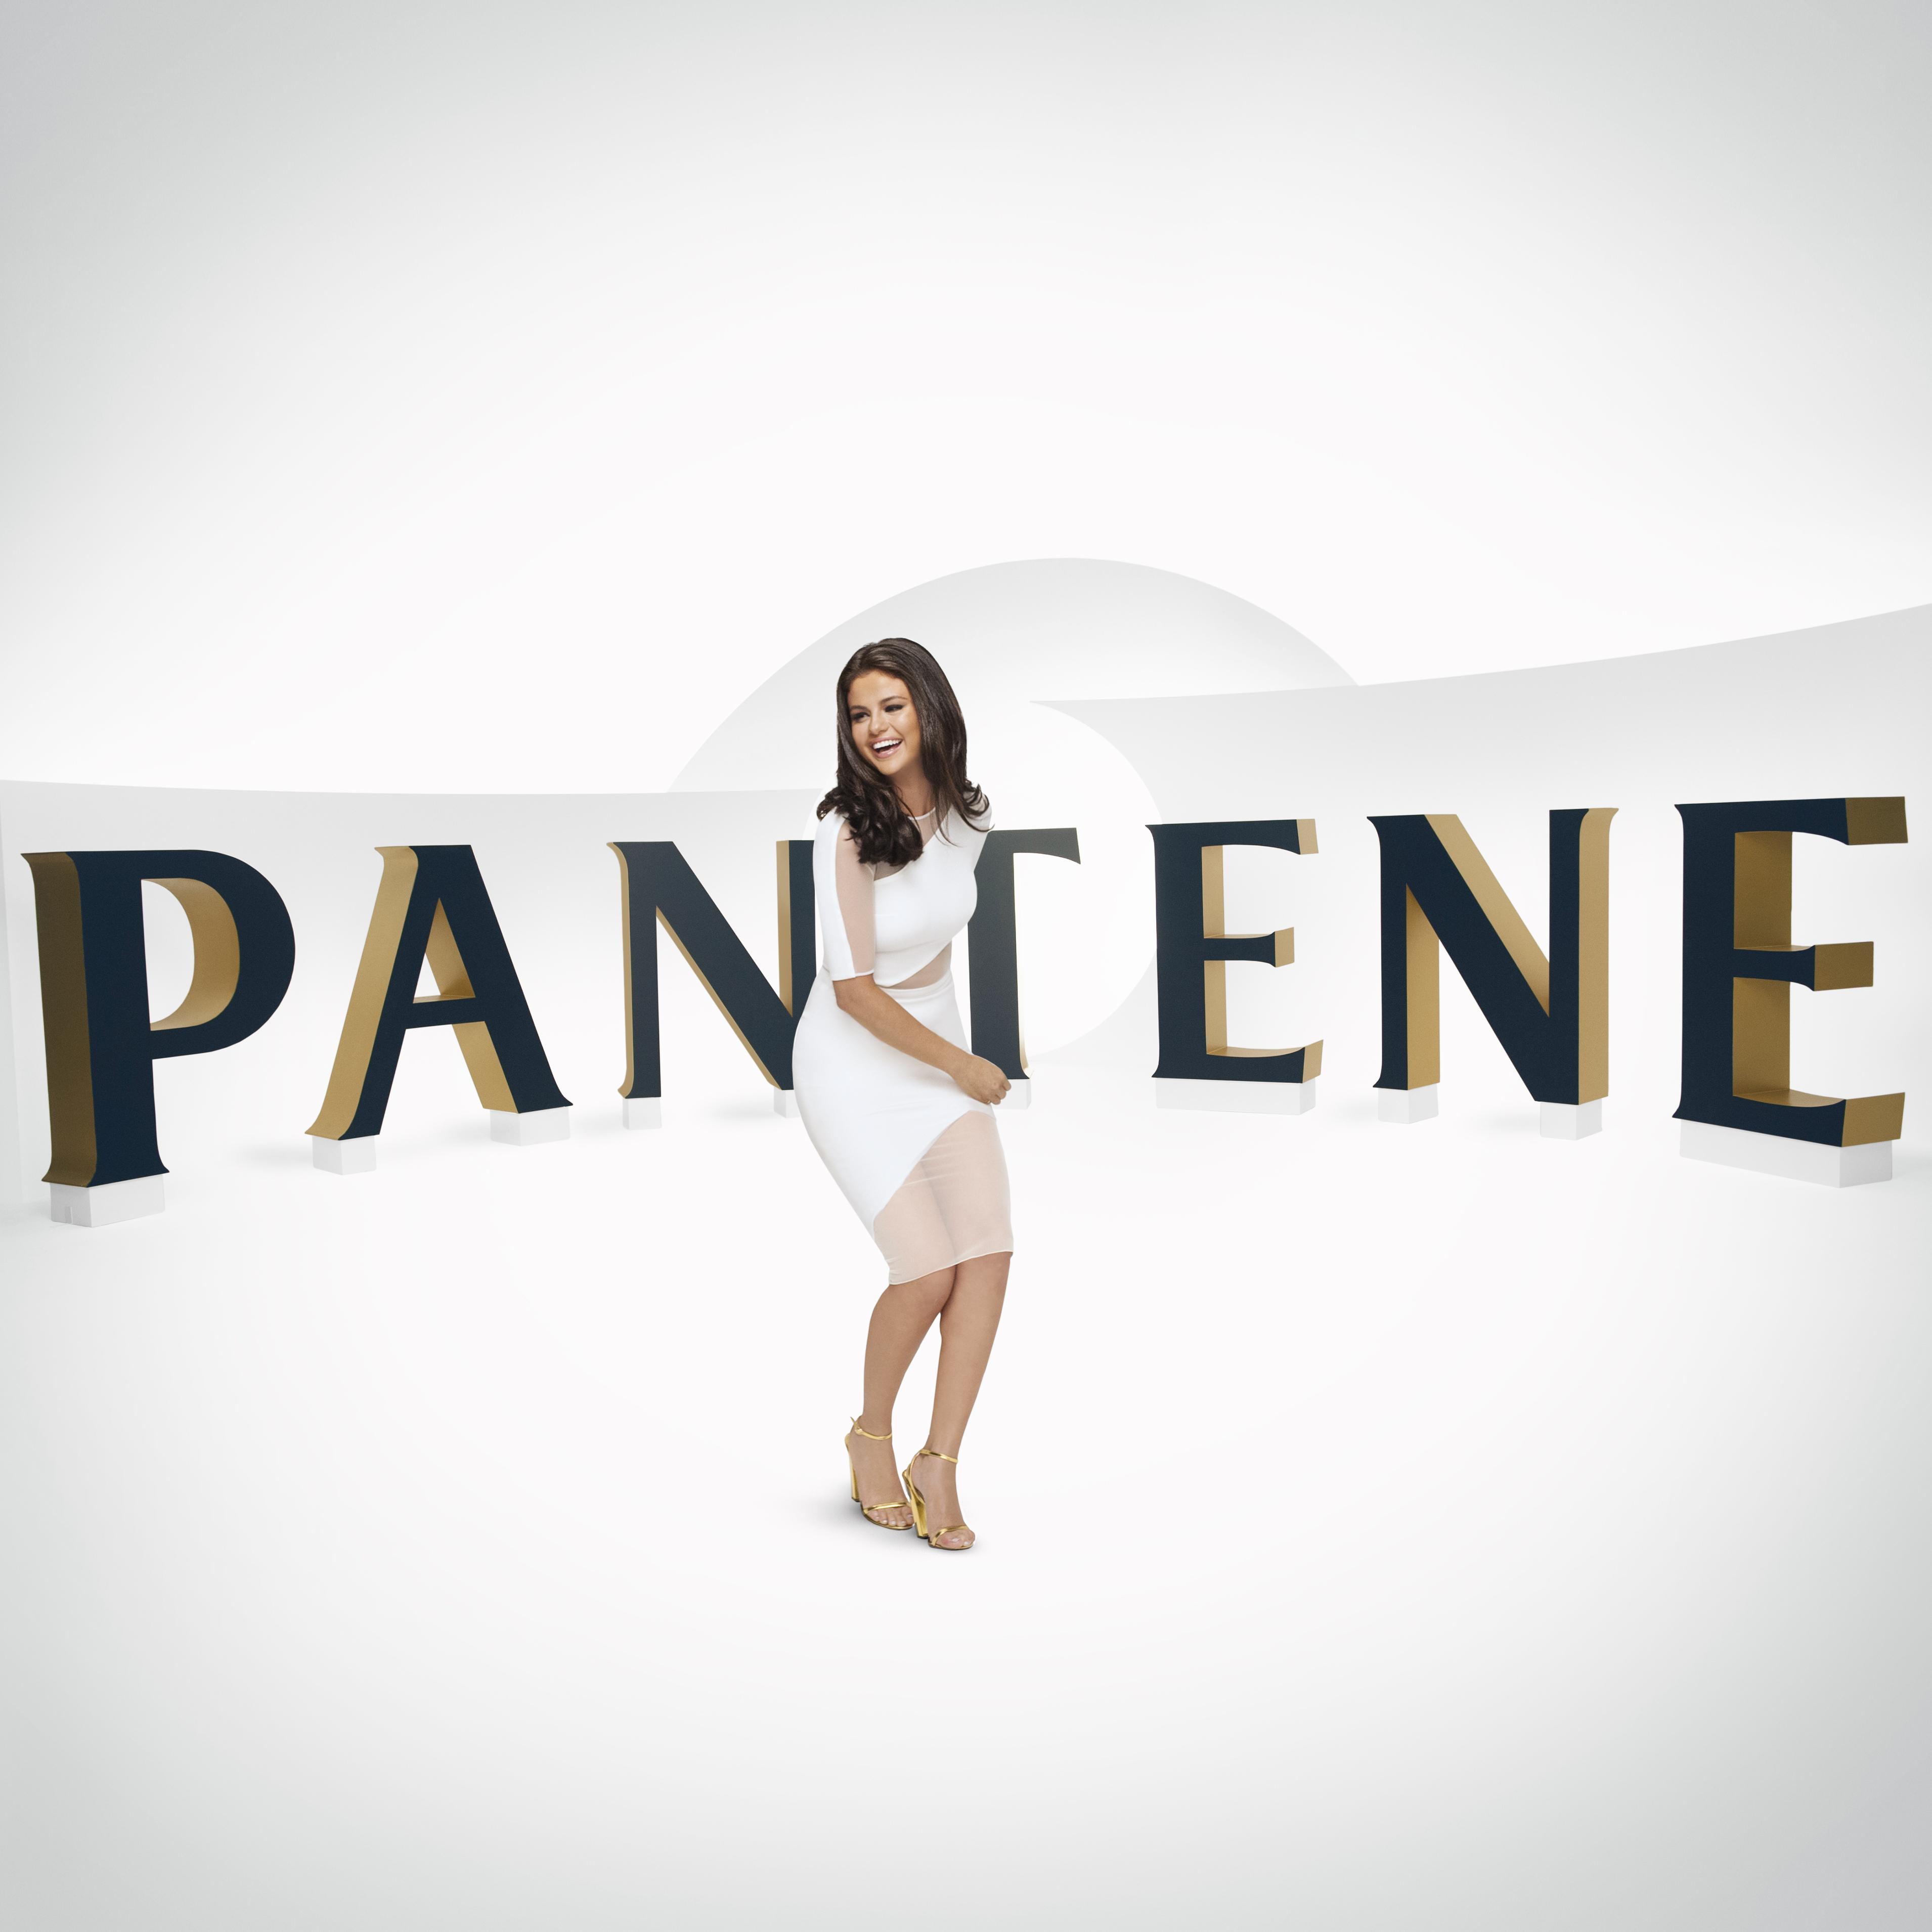 Selena Gomez Shines As Pantenes Newest Ambassador Pg News Pantane Download Full Size